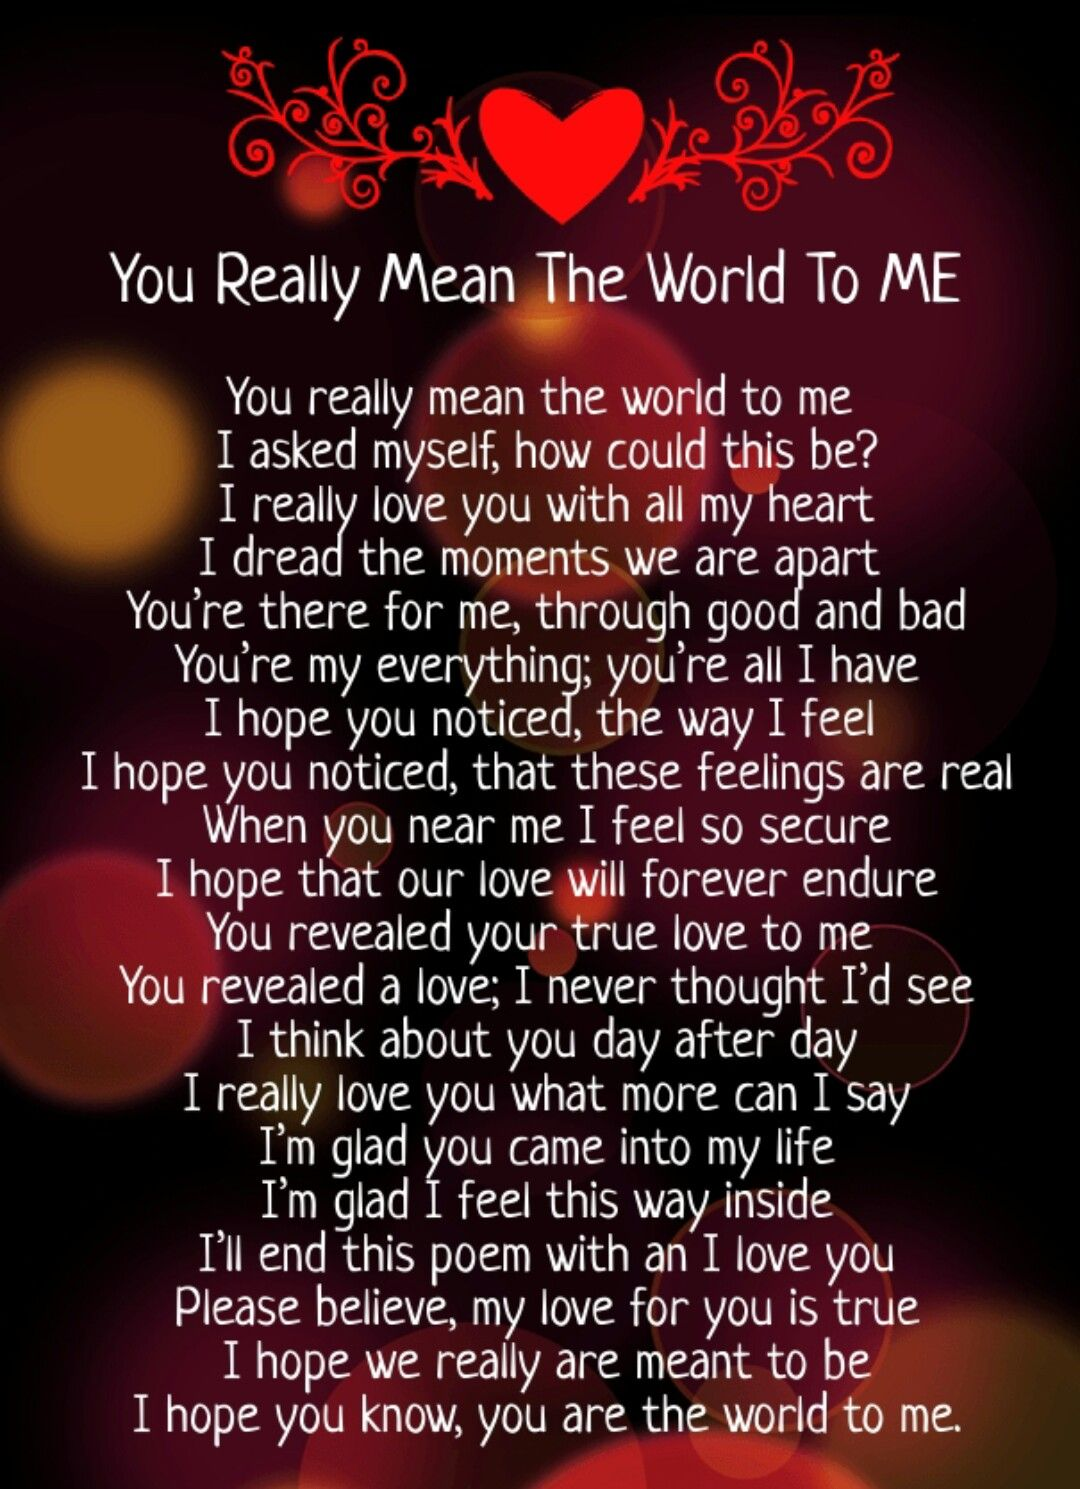 Idea by Dana Hamilton on Sayin' Love yourself quotes